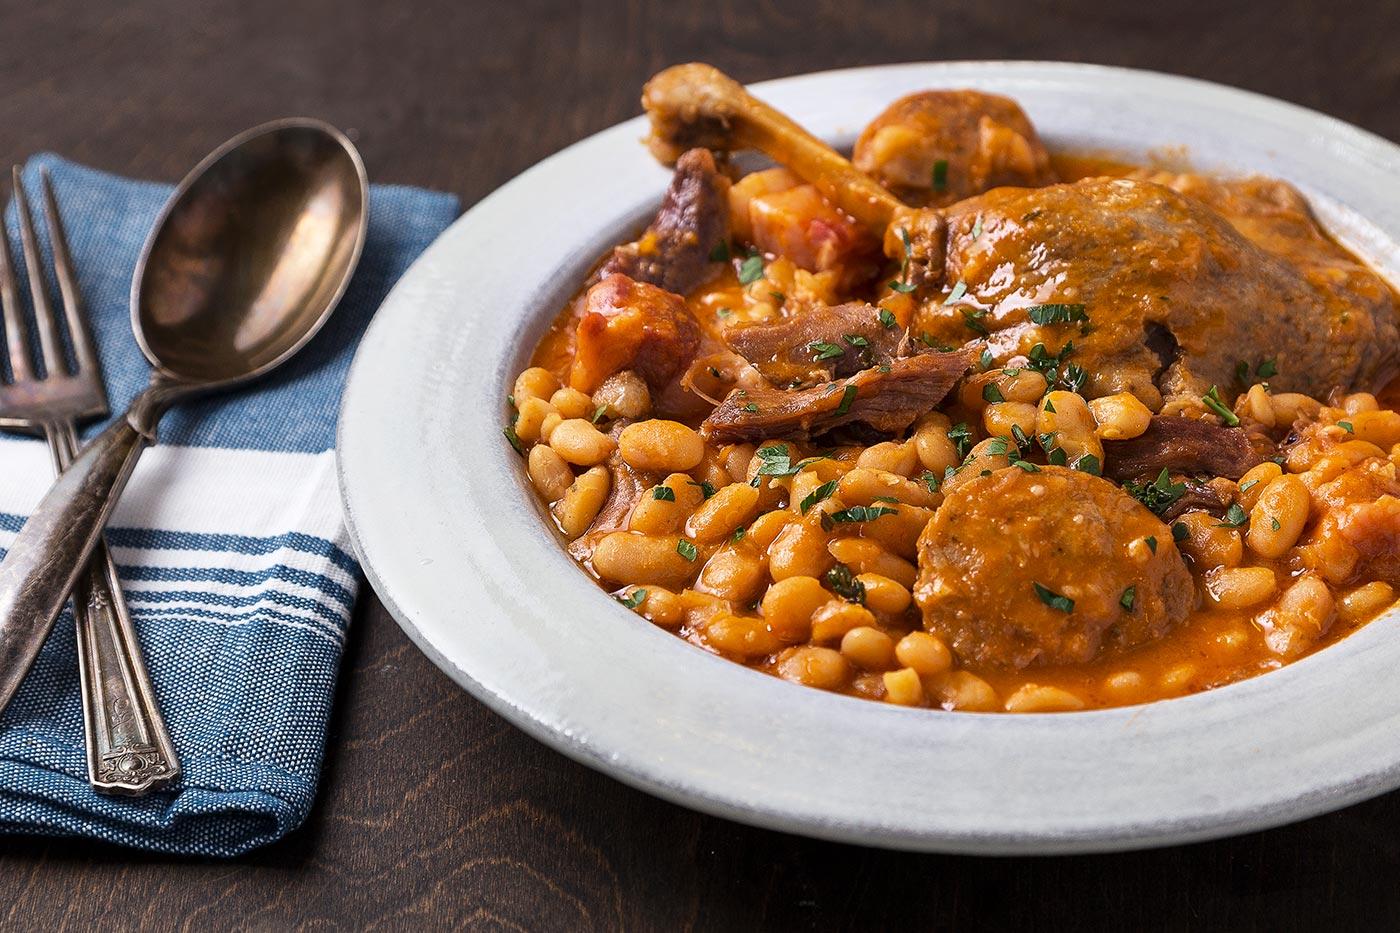 Quick & Easy Instant Pot Cassoulet (Duck & White Bean Stew) Recipe |  Tasting Table